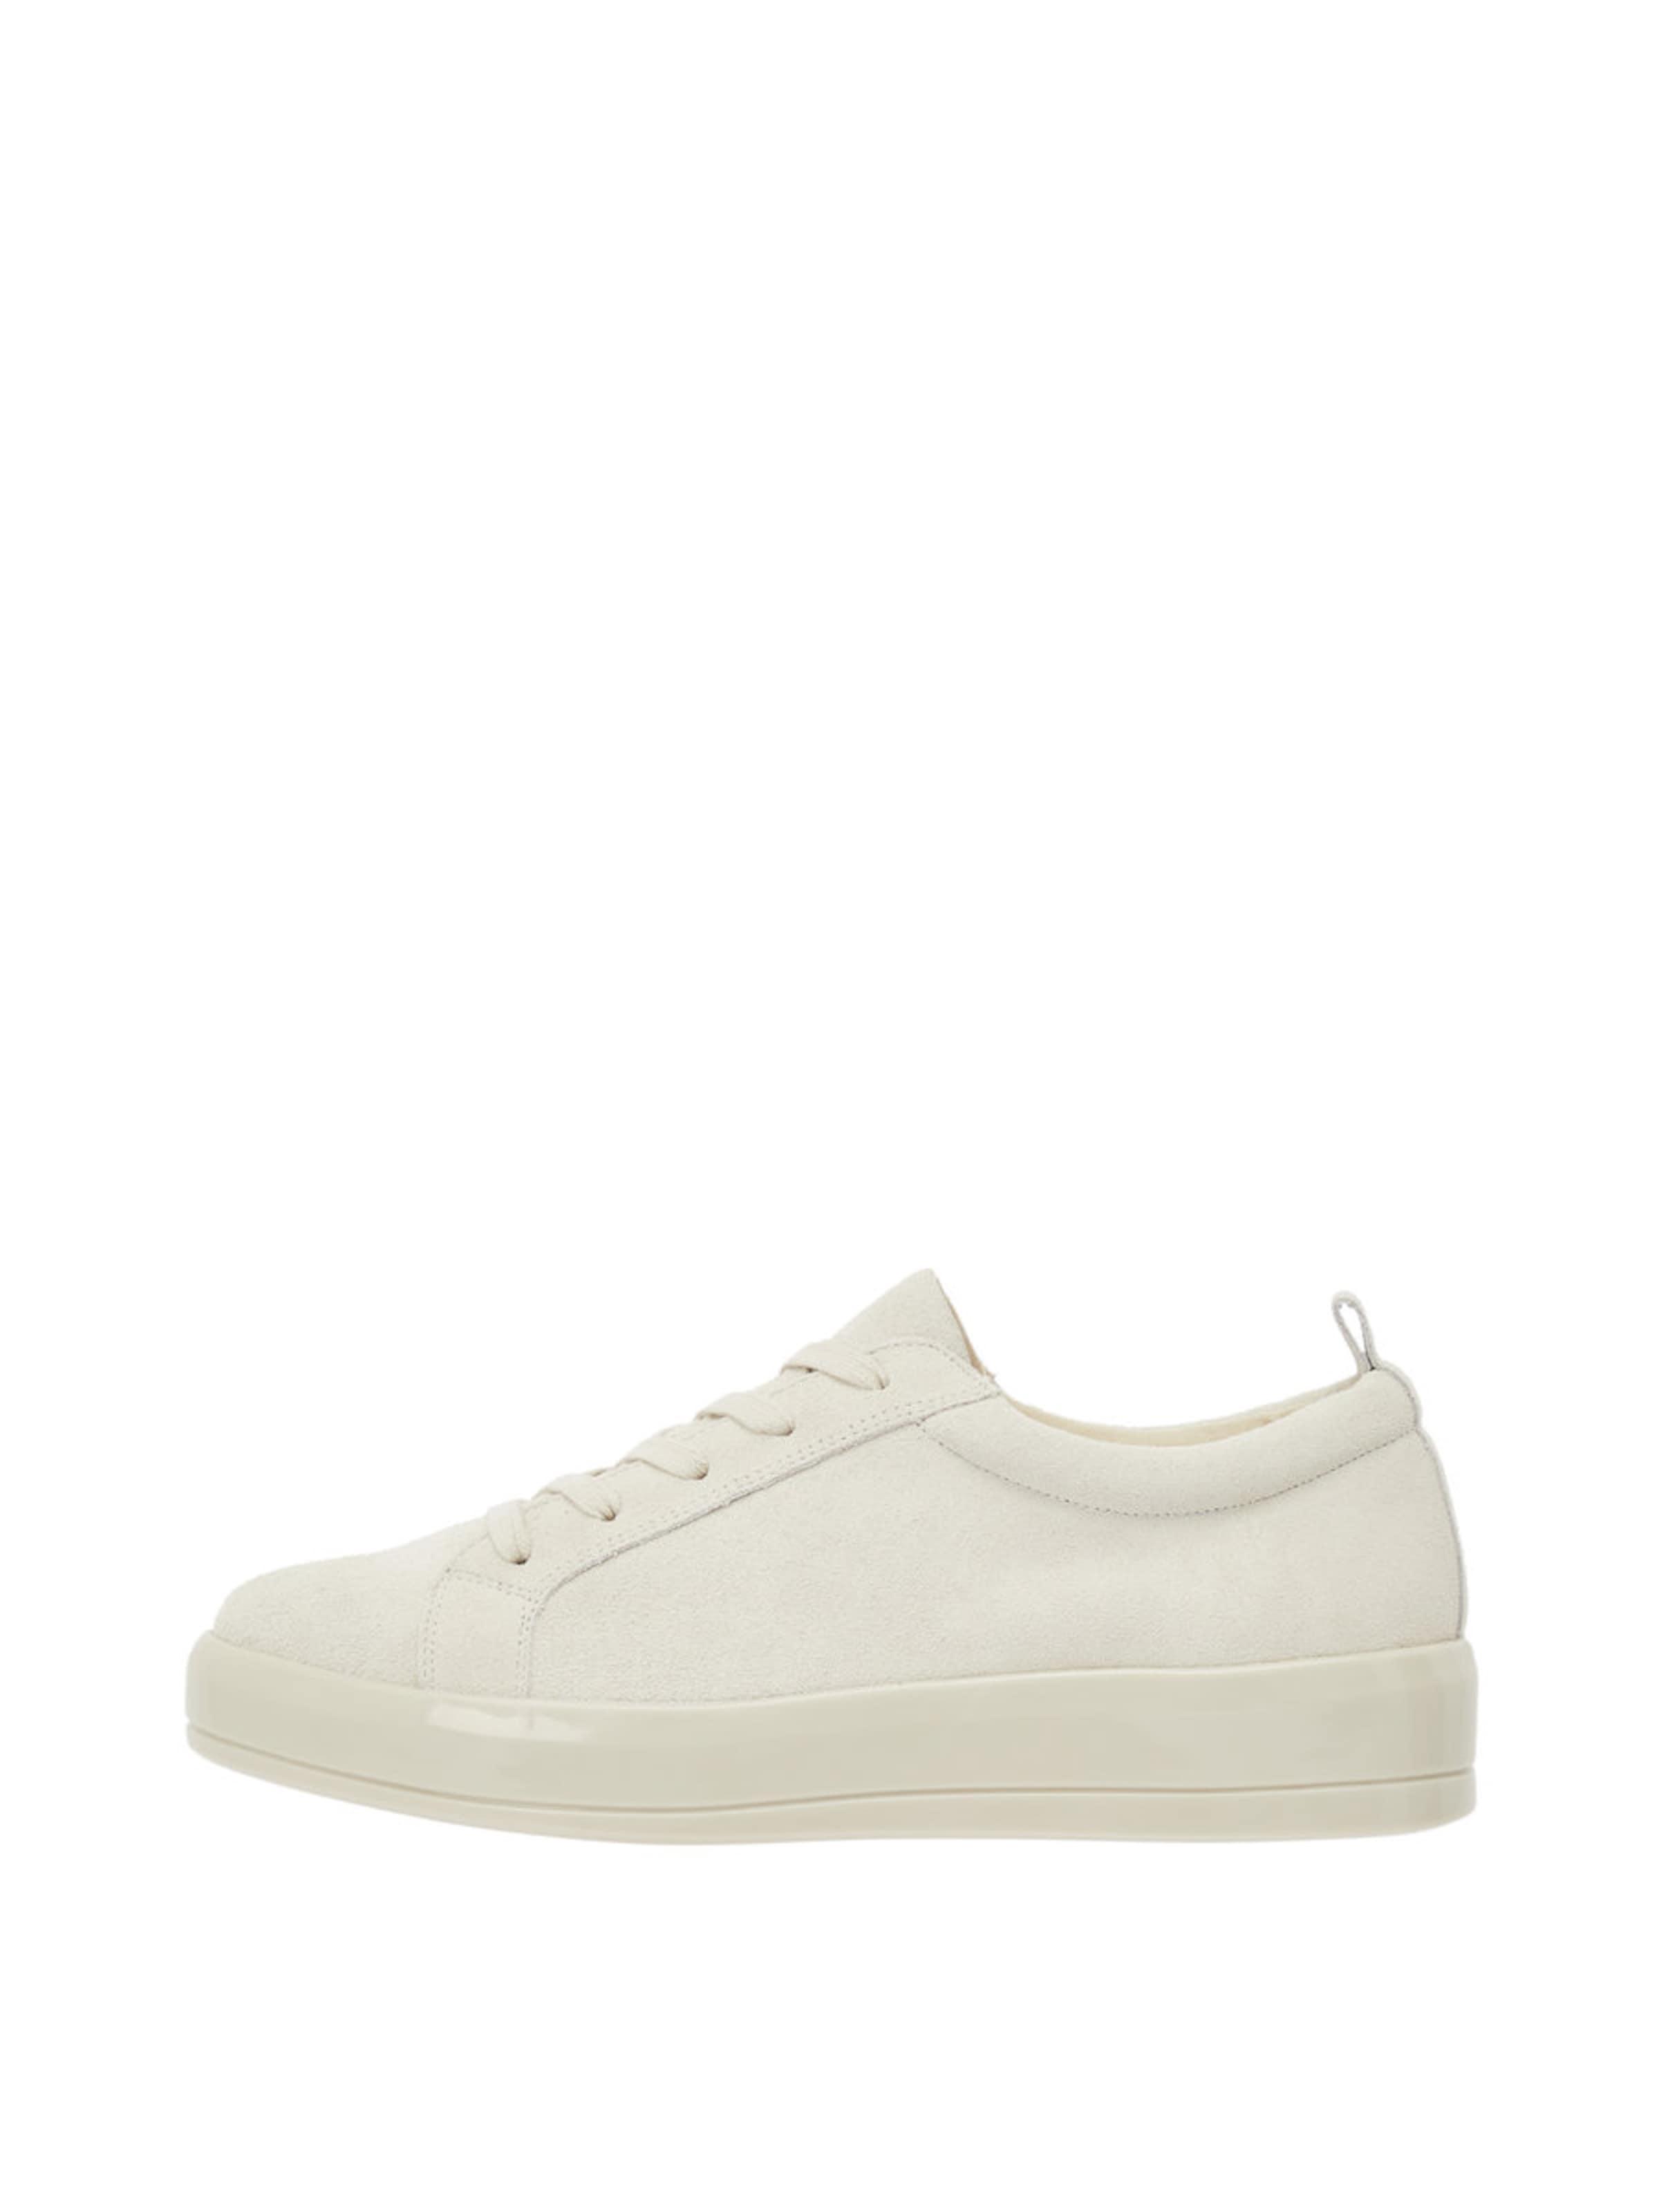 Haltbare Mode billige Schuhe Bianco | Geschnürte Leder Sneaker Schuhe Gut getragene Schuhe